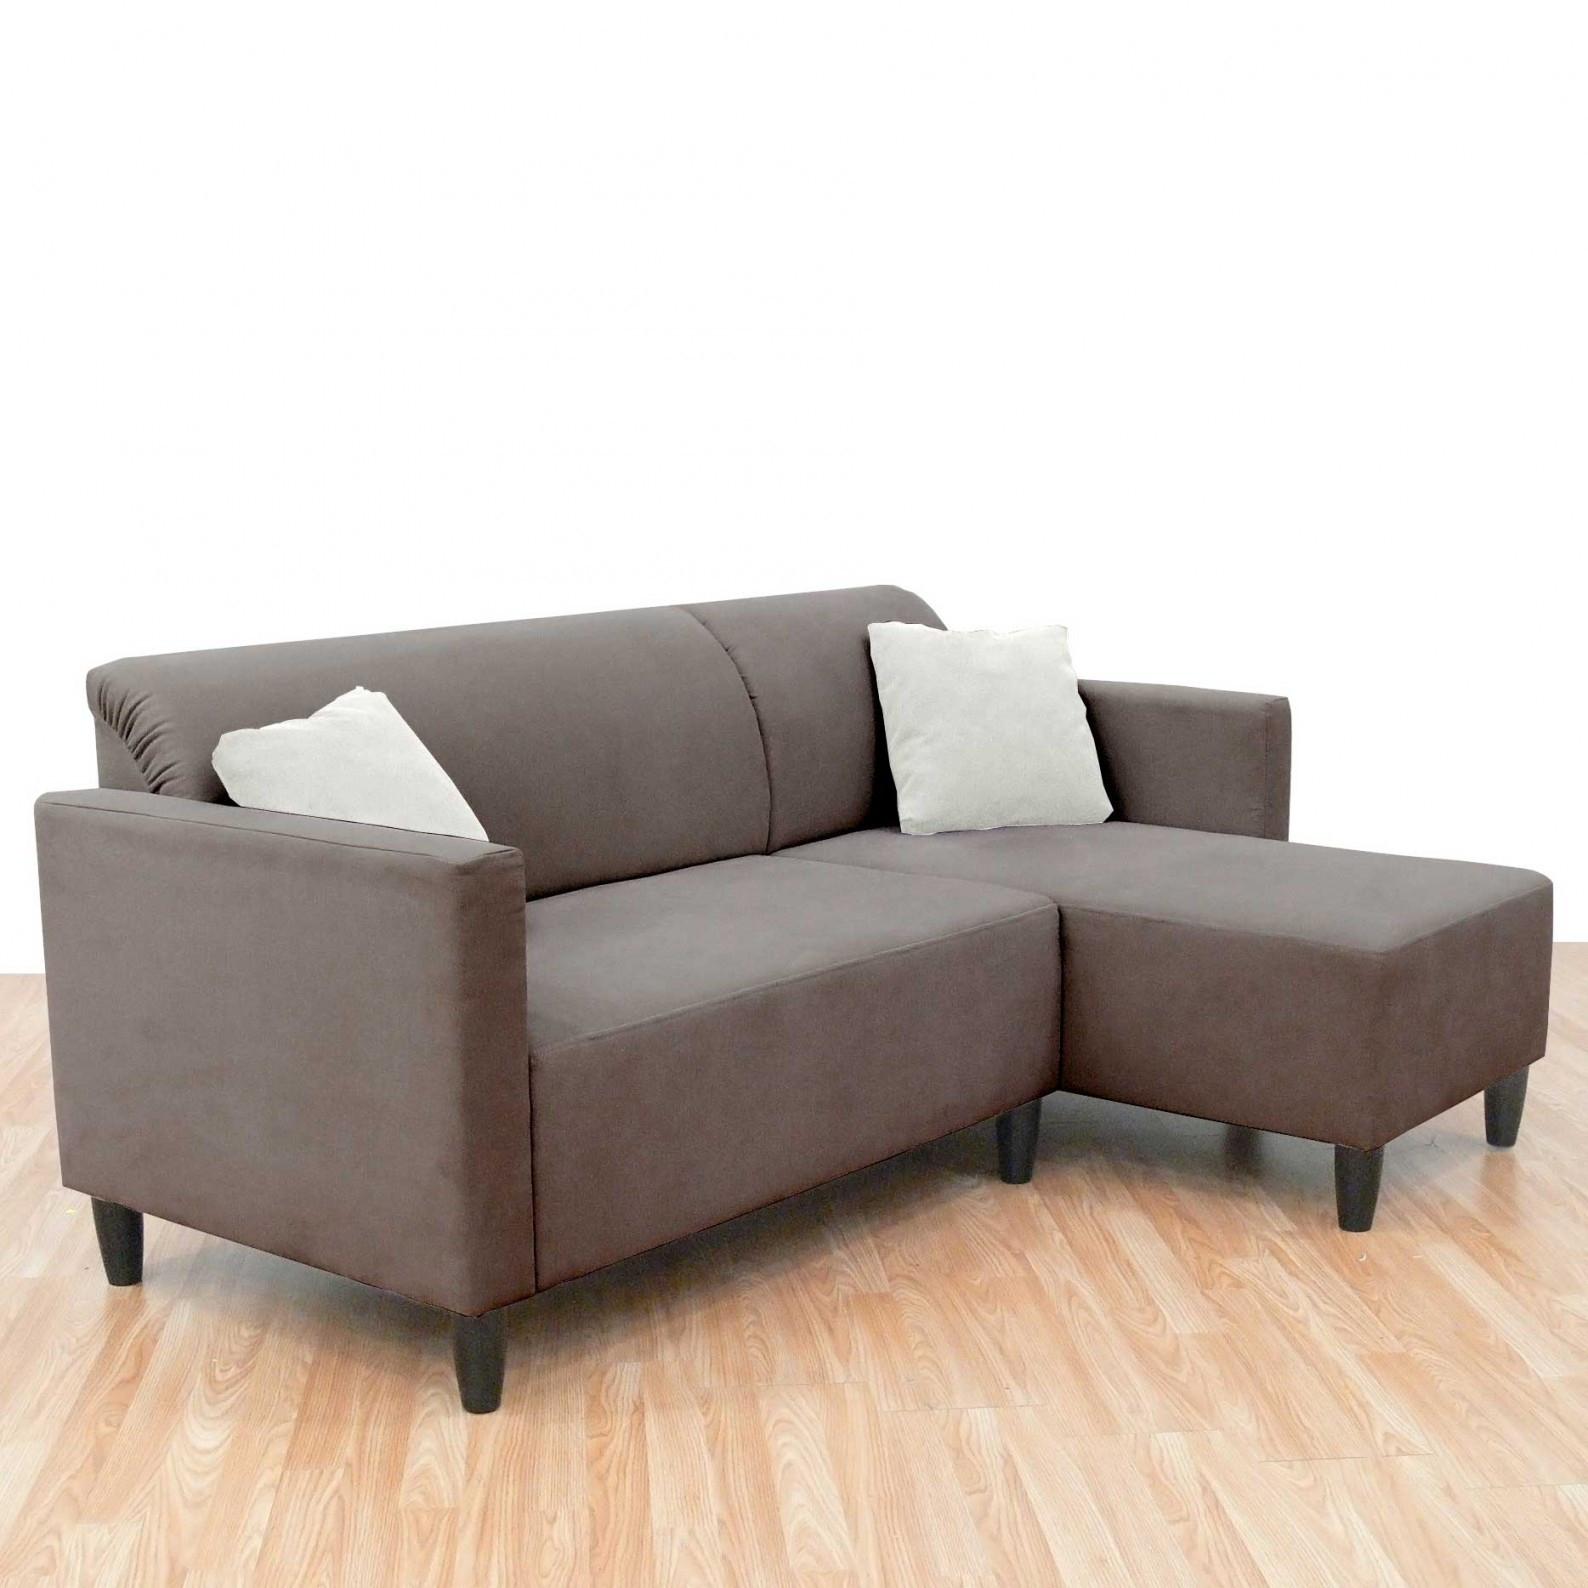 Canapé Convertible Angle Ikea Frais Galerie Canap Petit Angle Teinture Pour Canap En Cuir Lovely Waitro Page